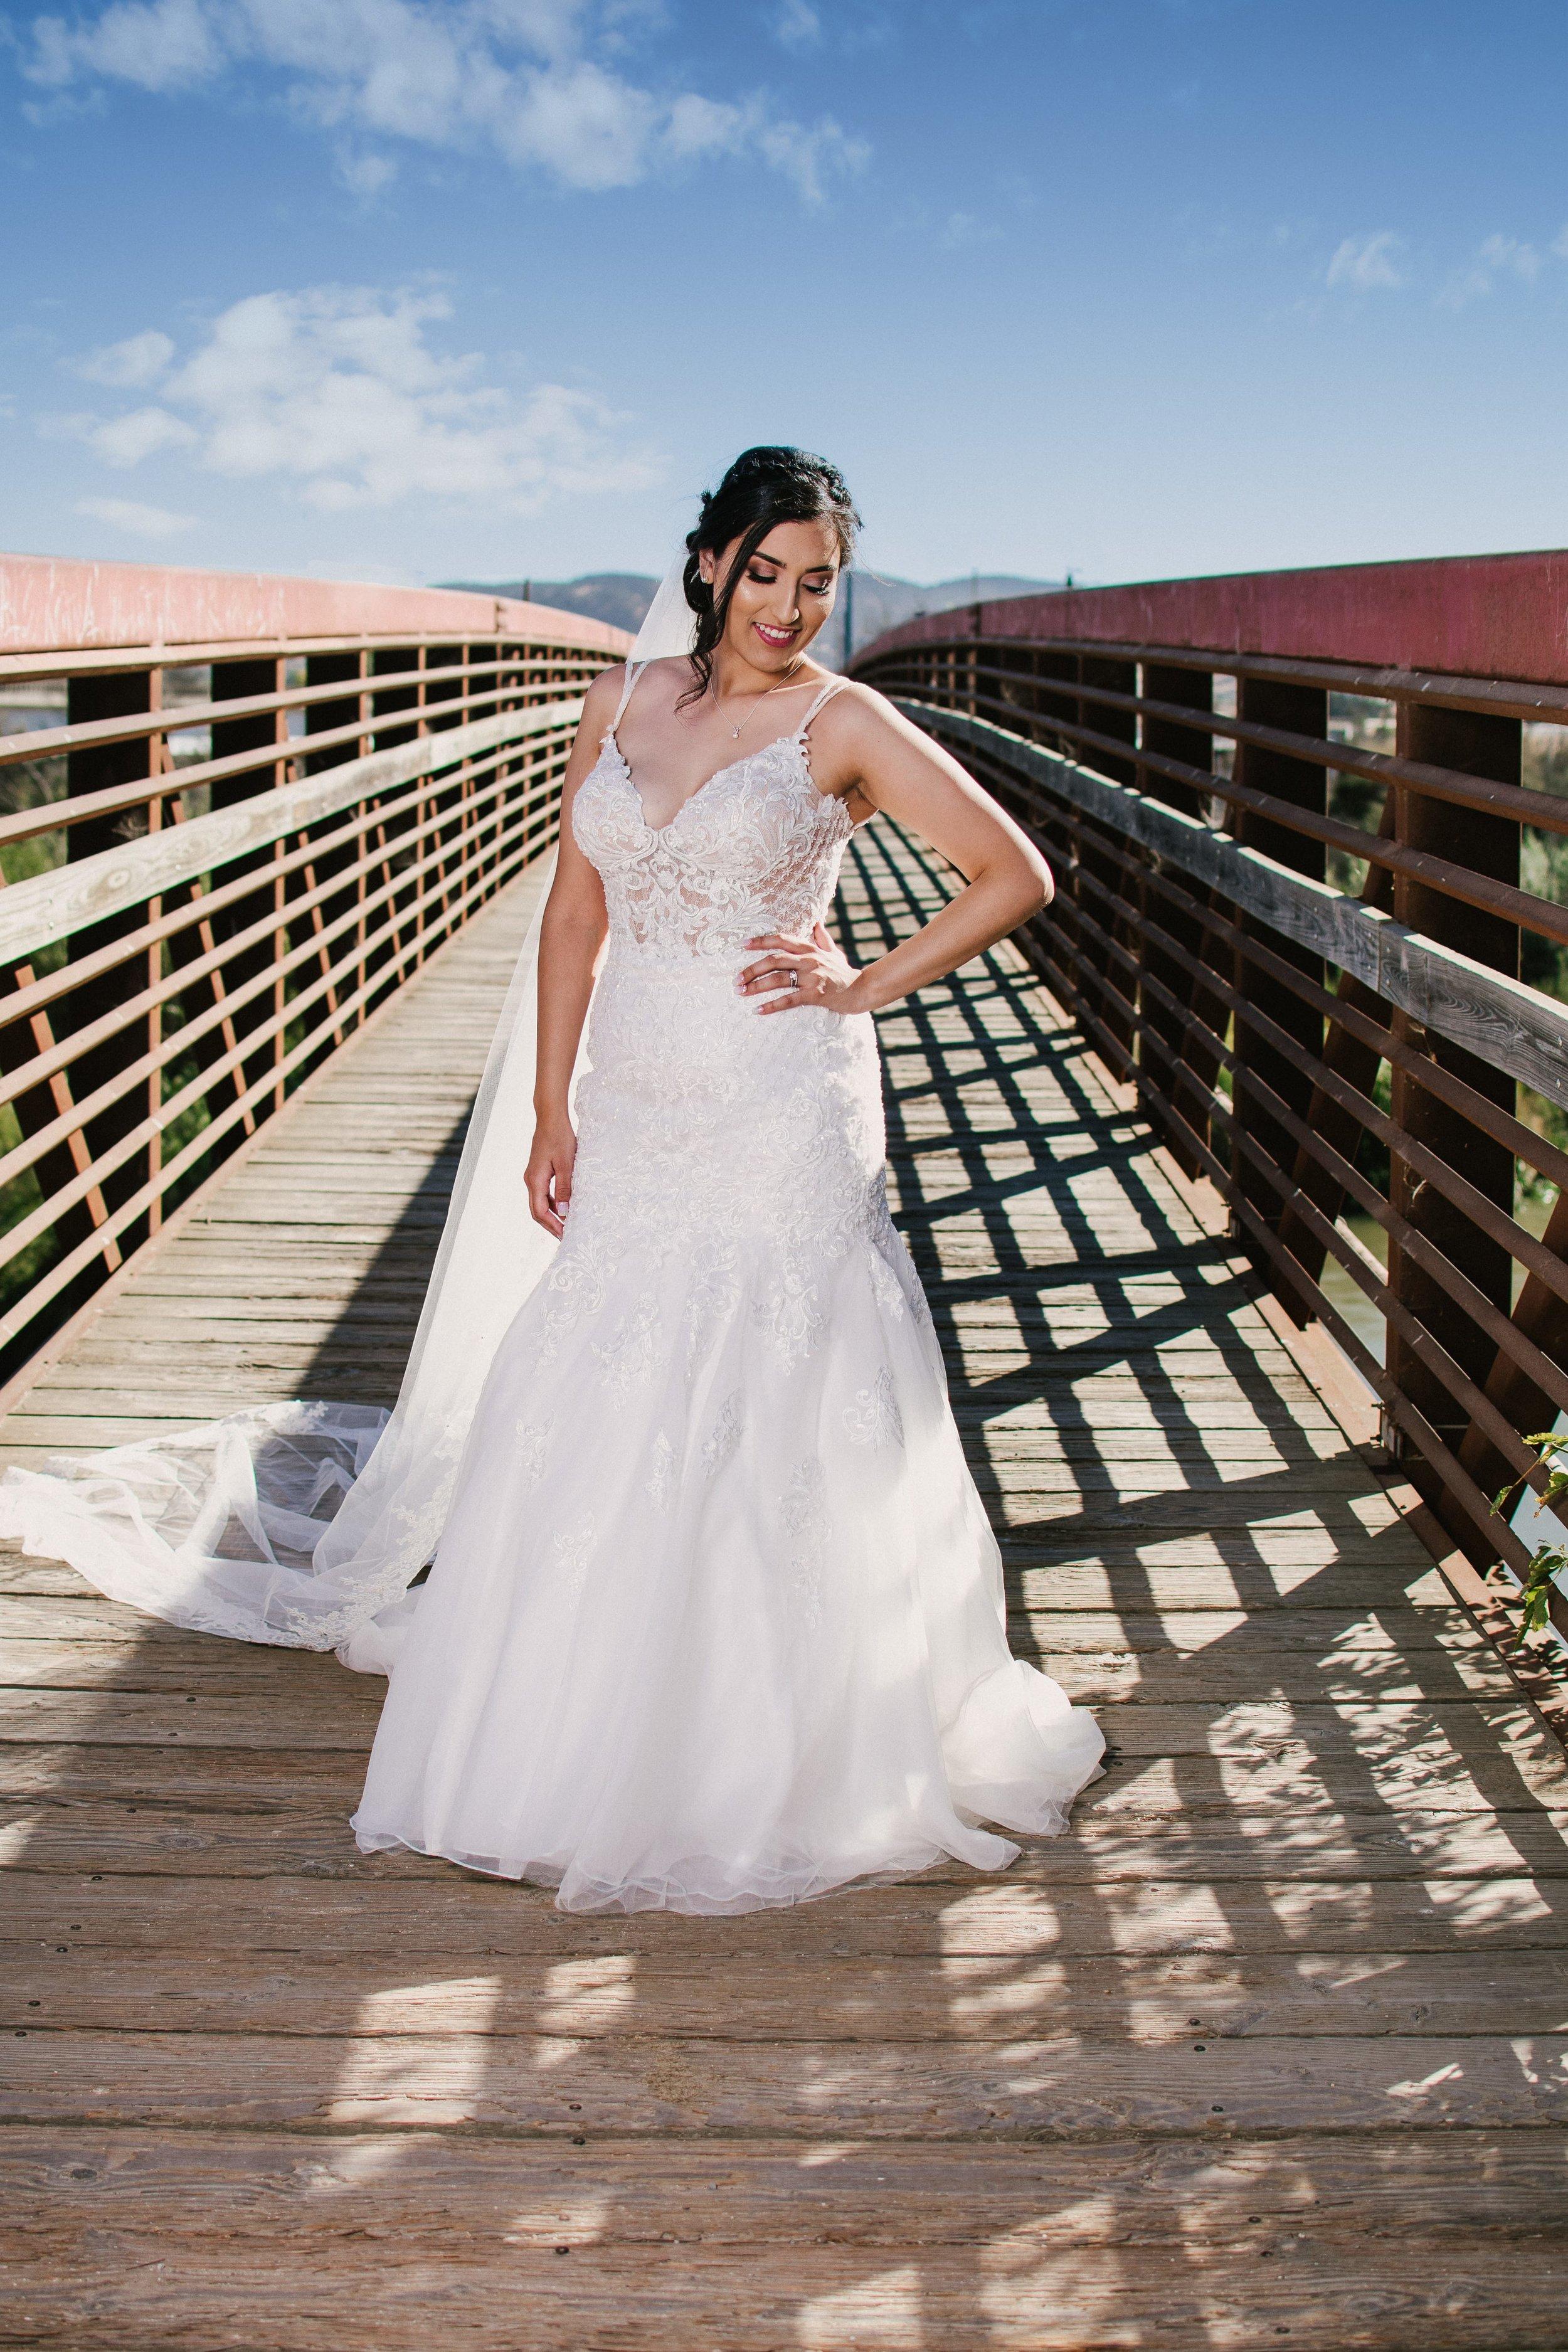 monterey-wedding-photographer-king-city-crystal-ivan-1-min.jpg